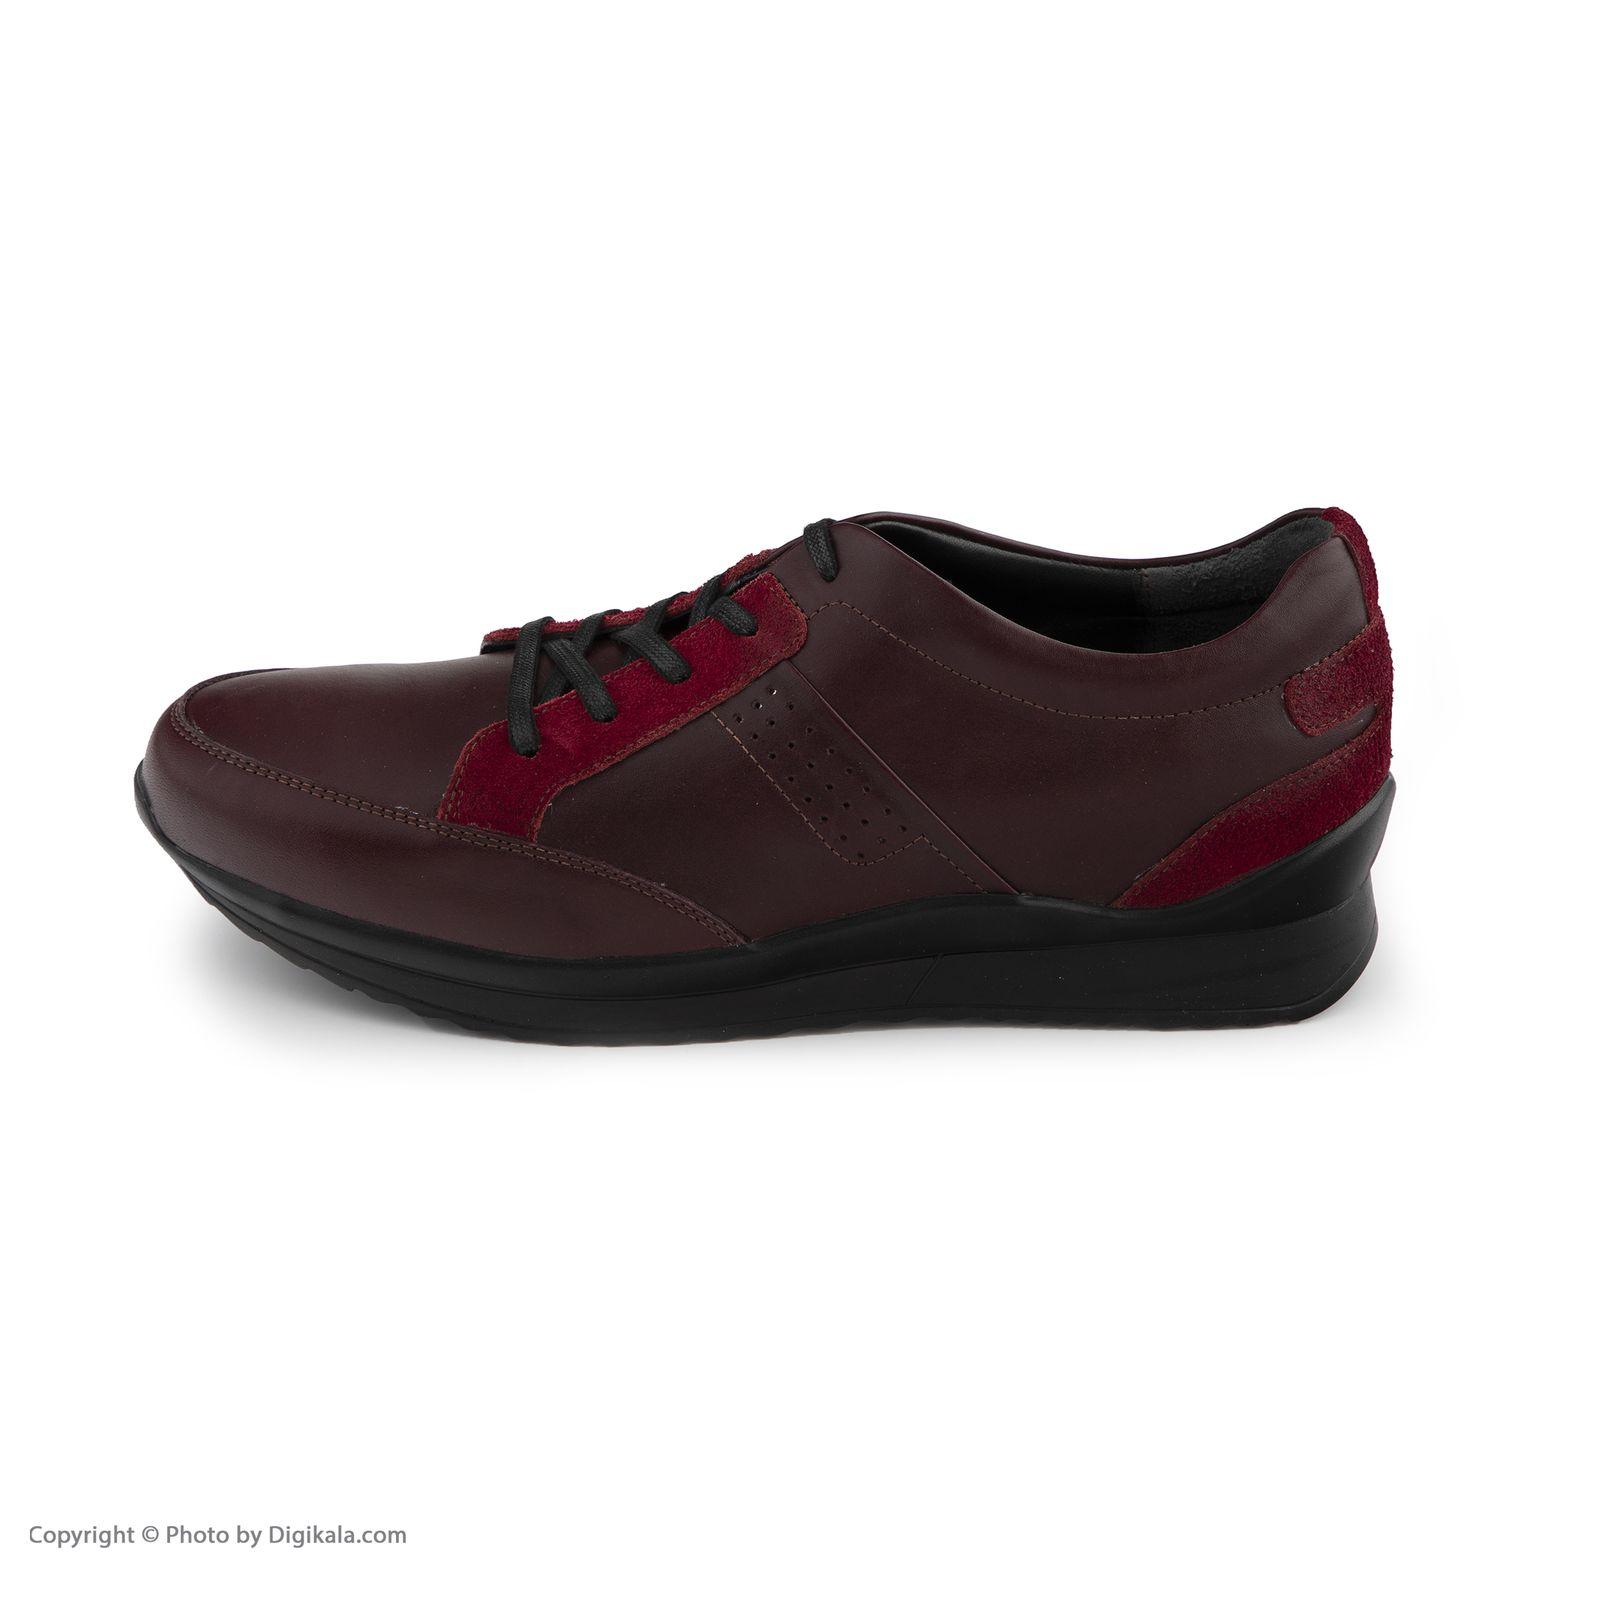 کفش روزمره مردانه چرمیران مدل 0389-Toma-005 -  - 3